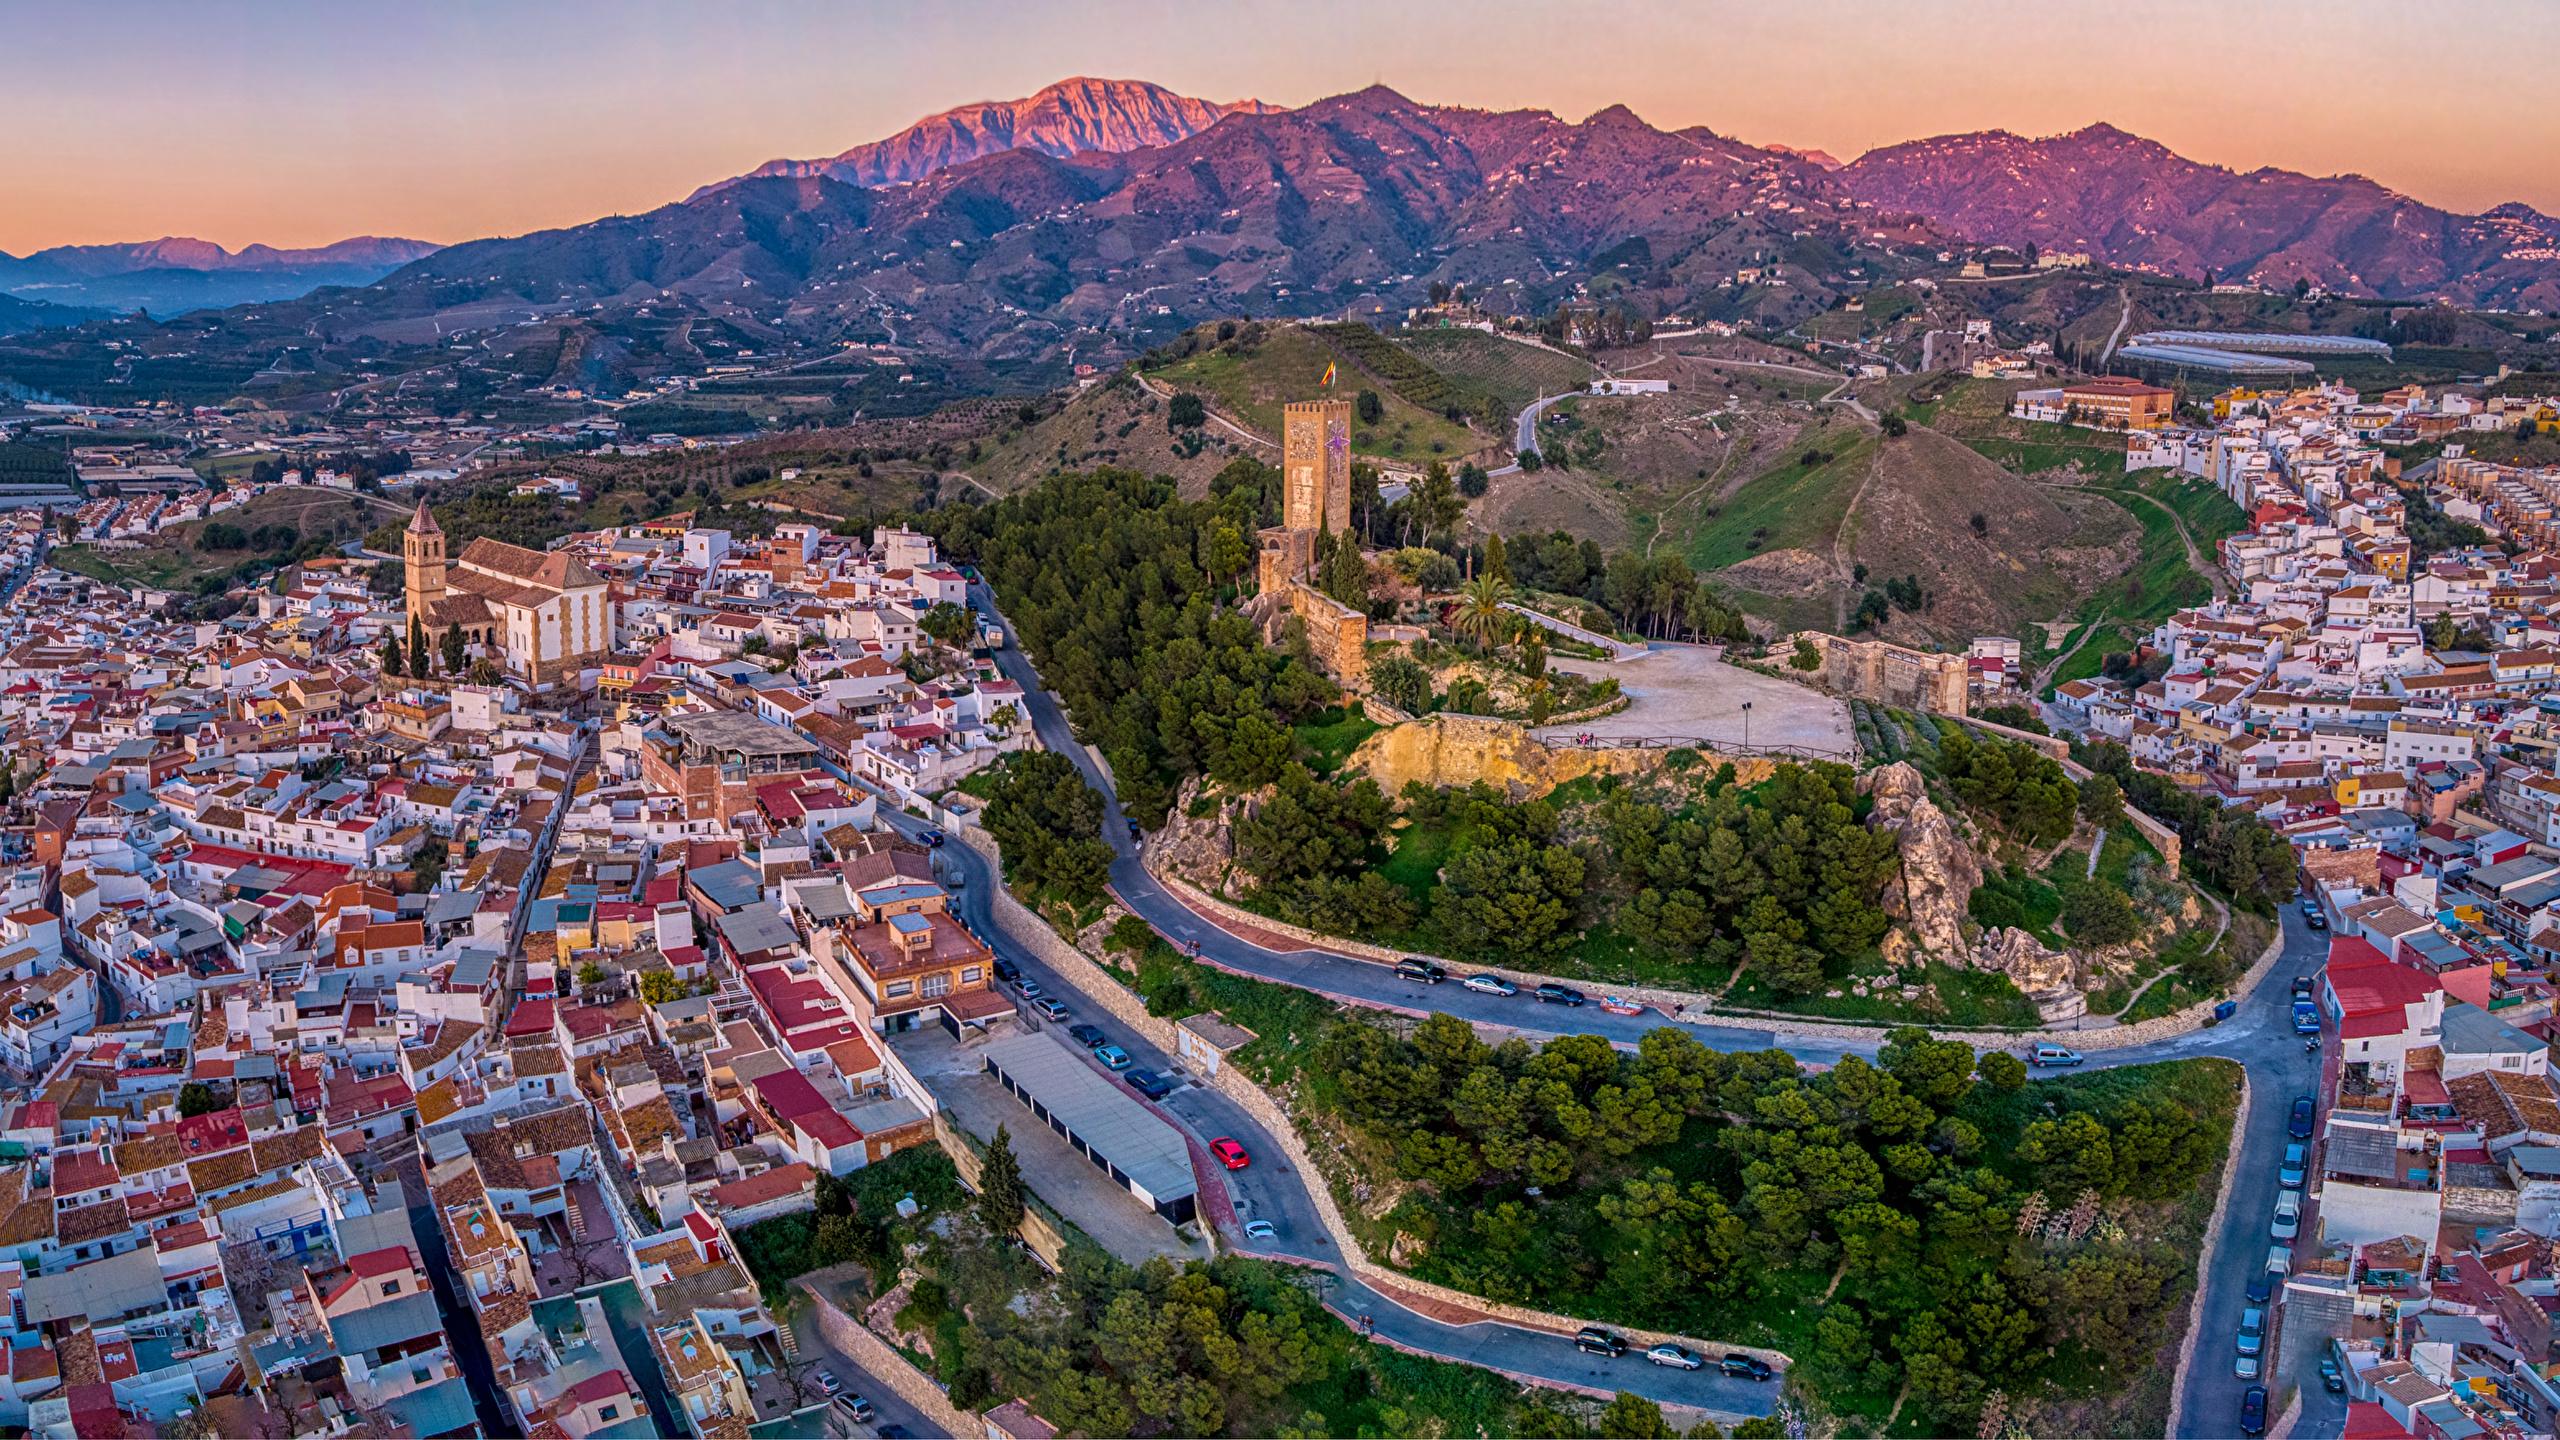 Картинки Испания Malaga холмов Дороги Сверху Дома Города 2560x1440 холм Холмы город Здания